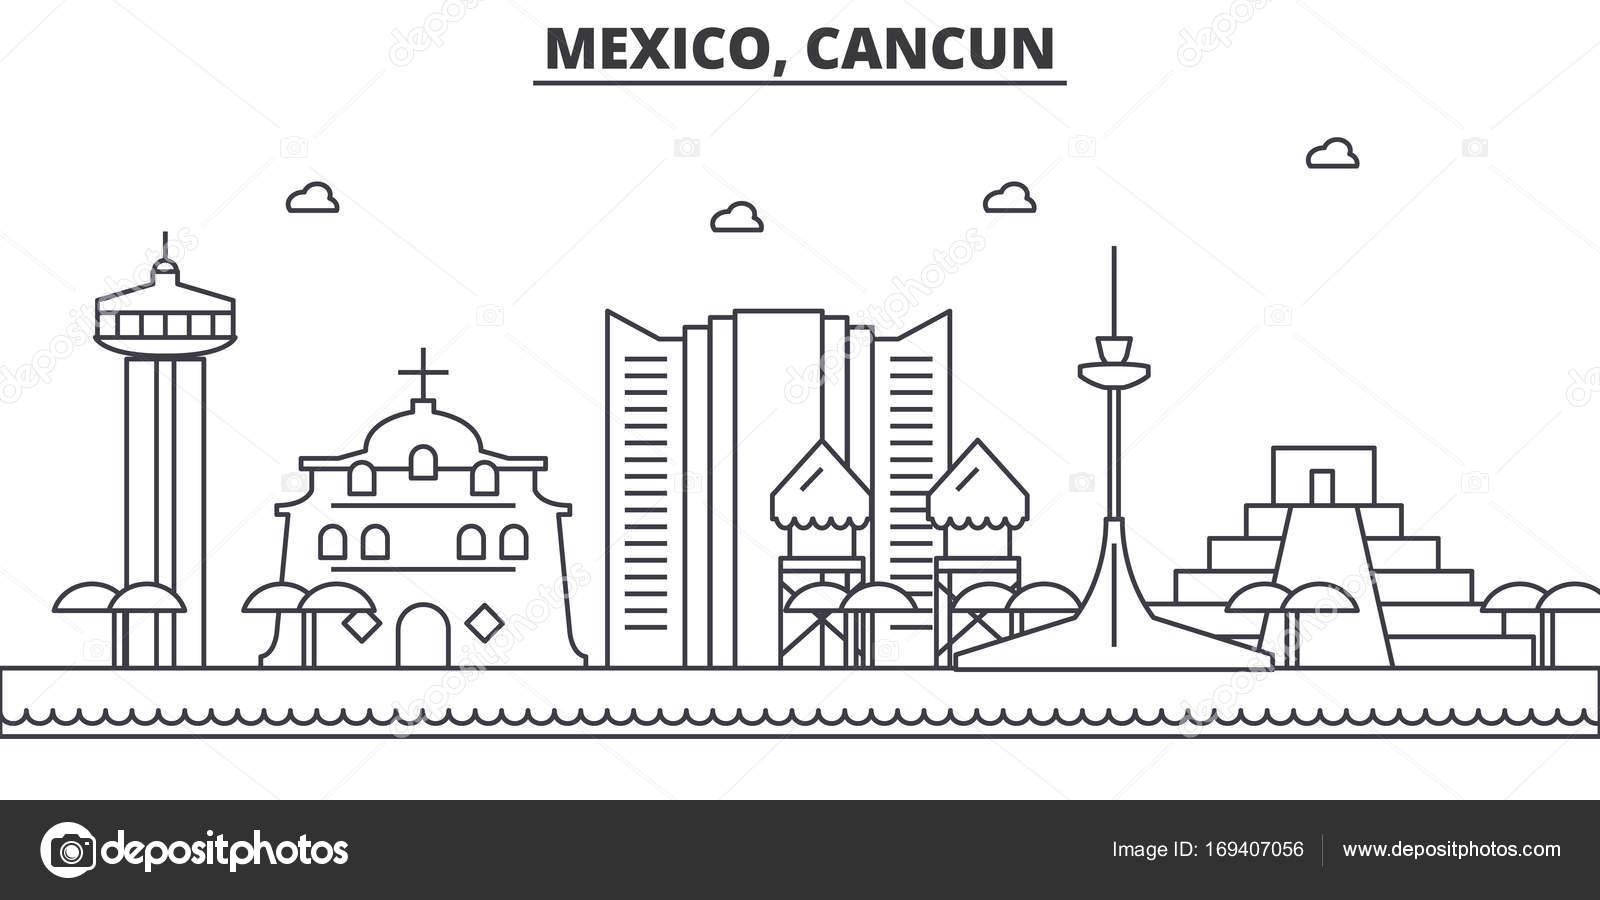 Mexico Cancun Architecture Line Skyline Illustration Linear Vector